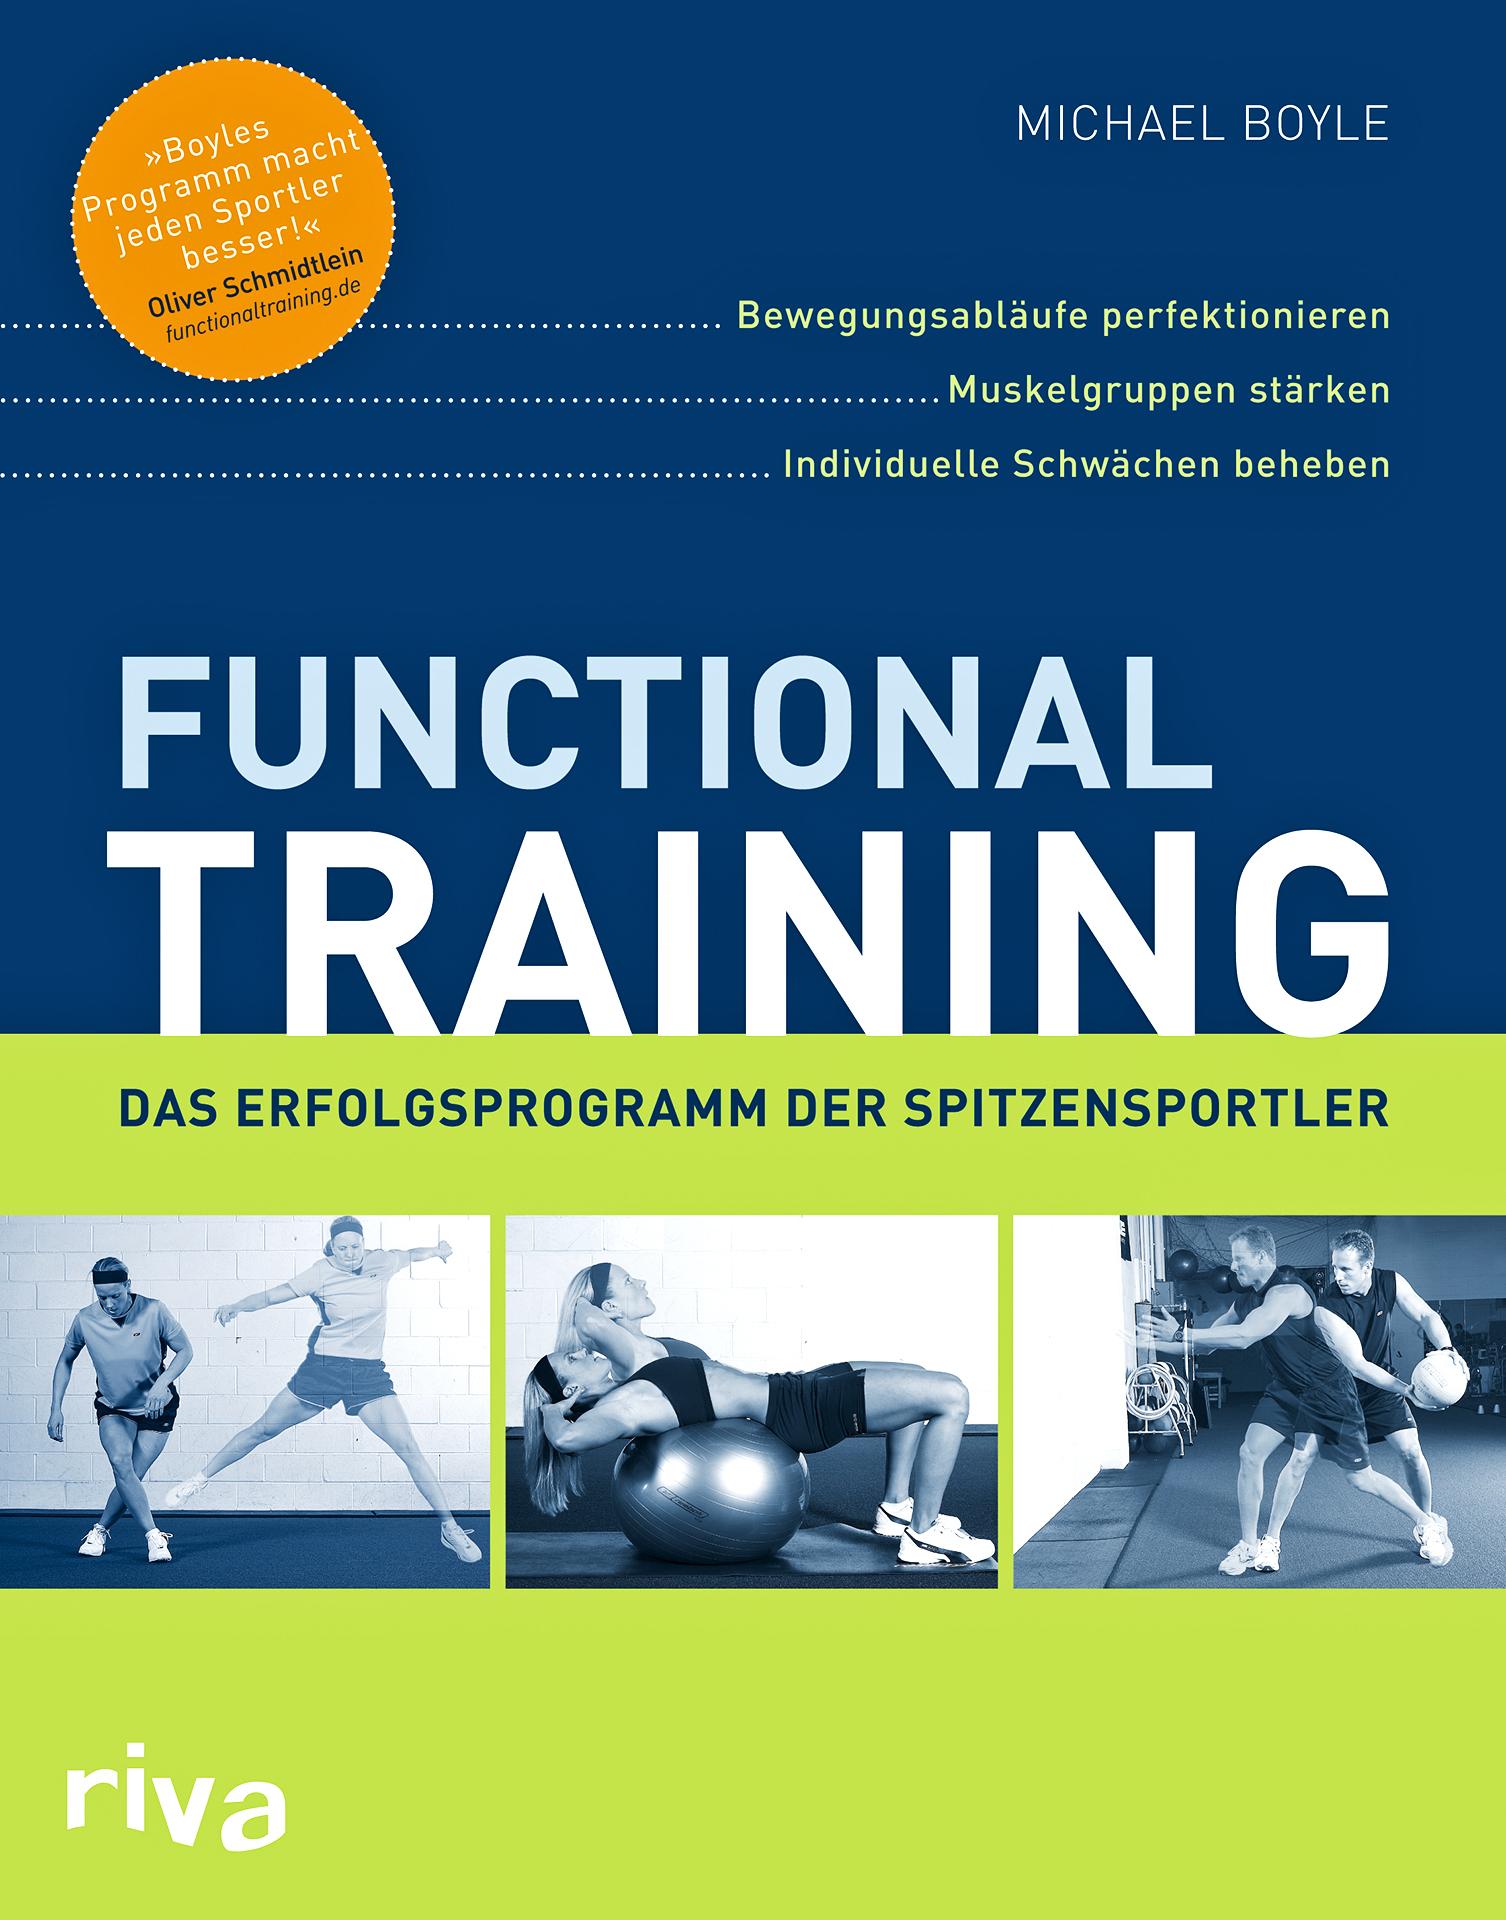 Buchcover: Michael Boyle, Functional Training – Bewegungsabläufe perfektionieren, Muskelgruppen stärken, individuelle Schwächen beheben